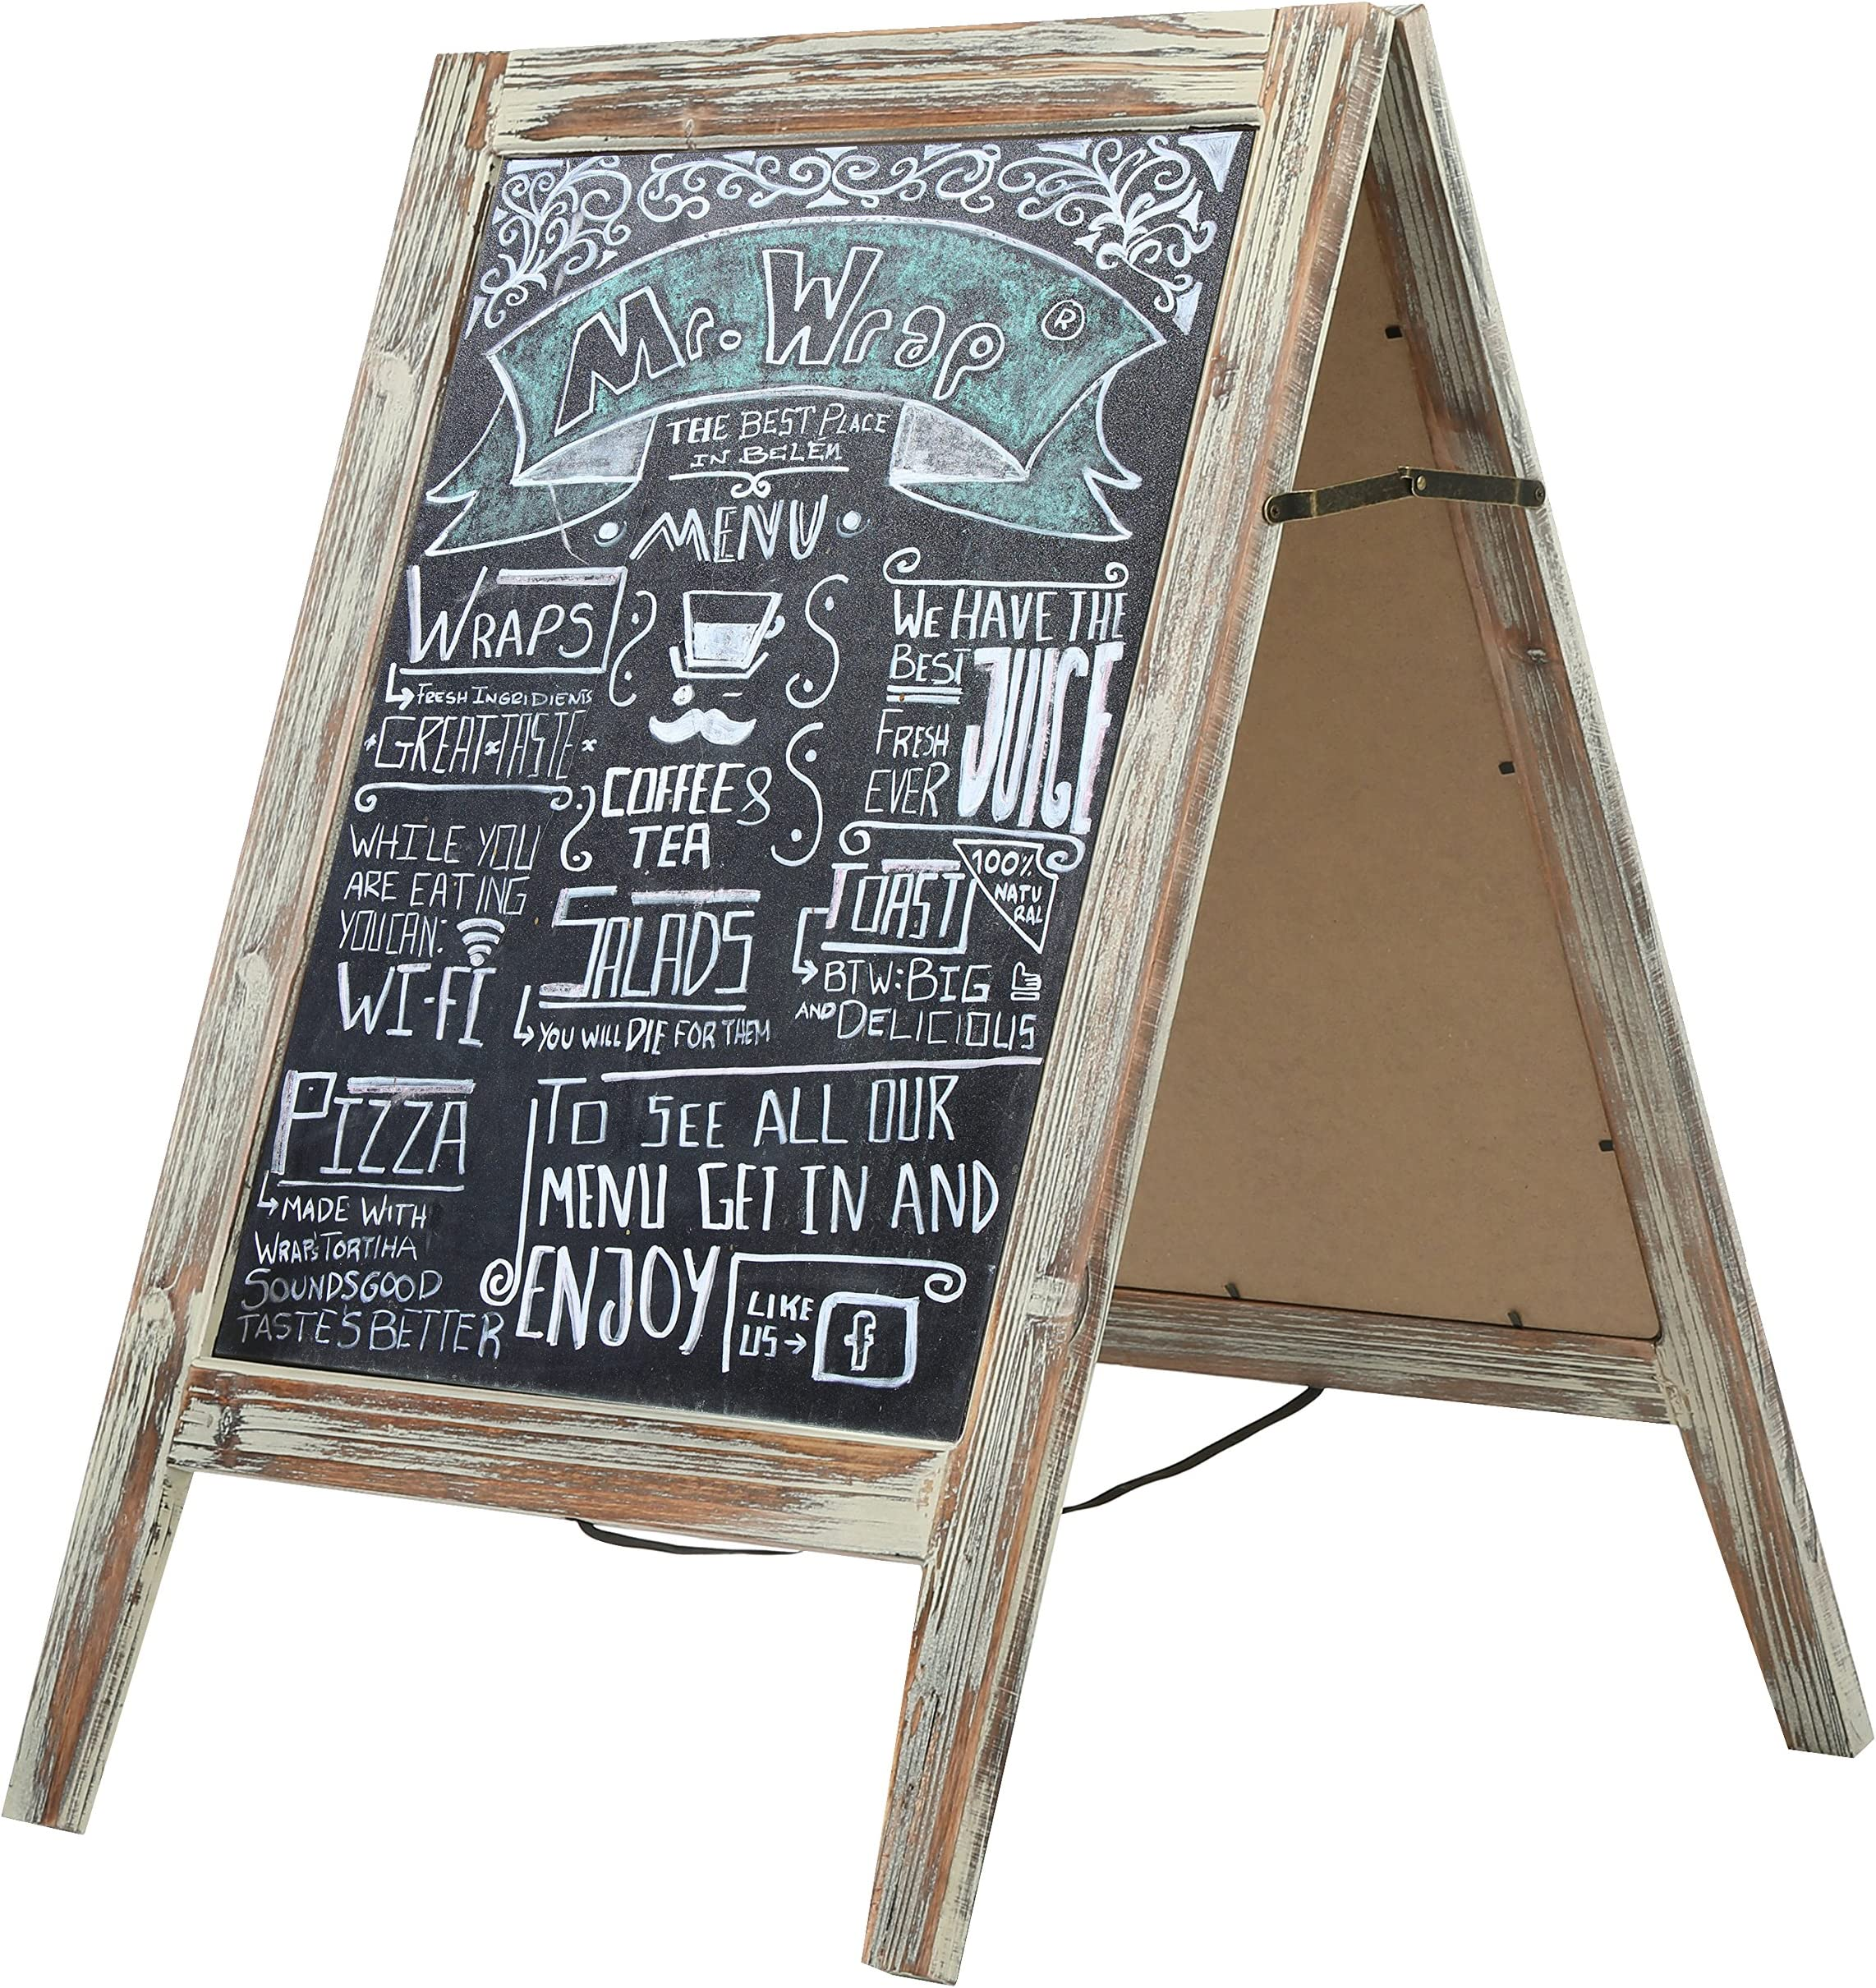 Easel Chalkboard sign Double Sided Sandwich Personalized A-frame Chalkboard Event Sign Business Sign Restaurant Sign Sidewalk Sign